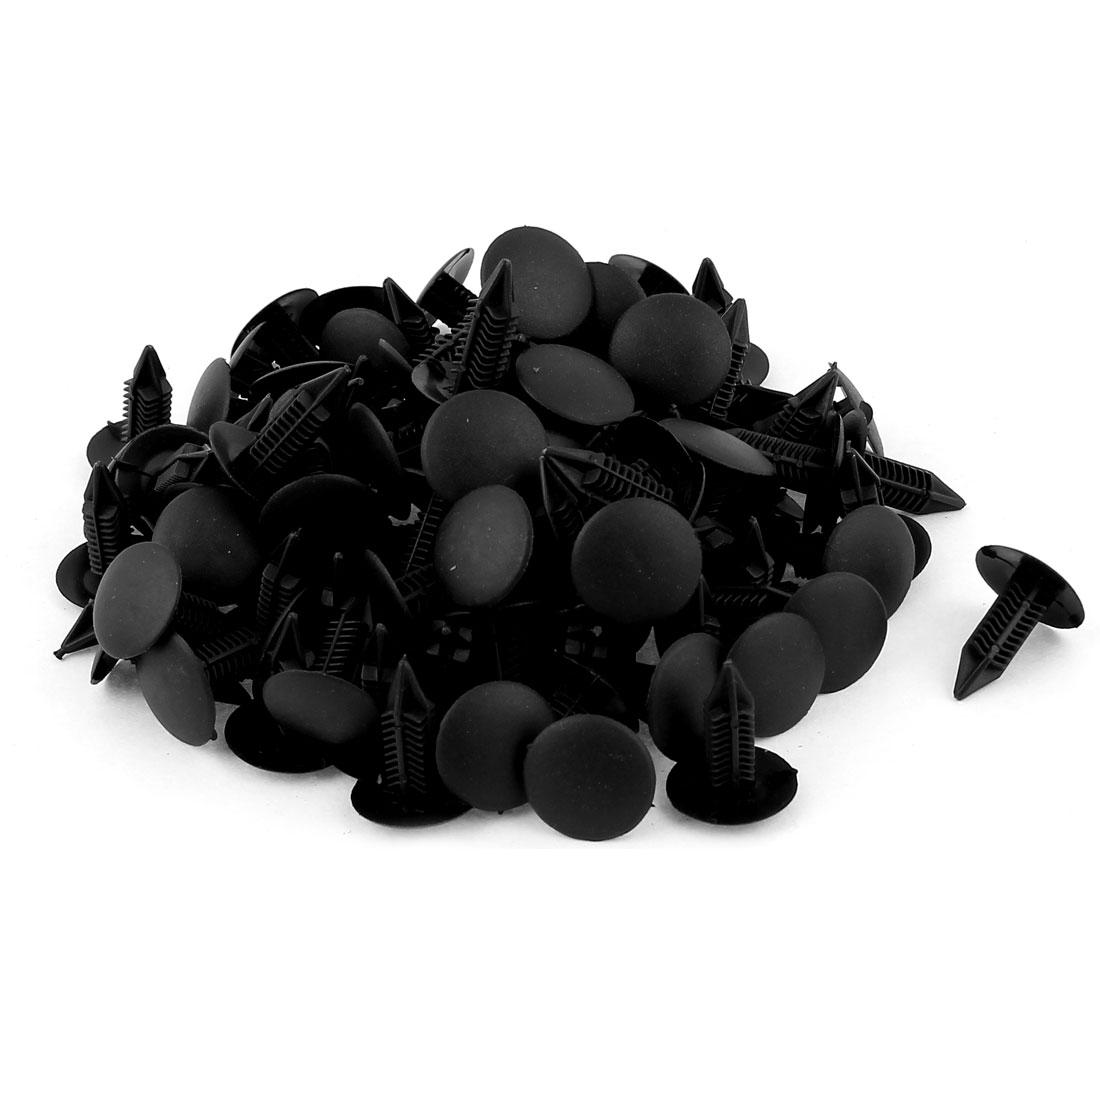 100pcs Black Car Bumper Retainer Plastic Rivets 6.5 x 6.5mm Hole for Toyota